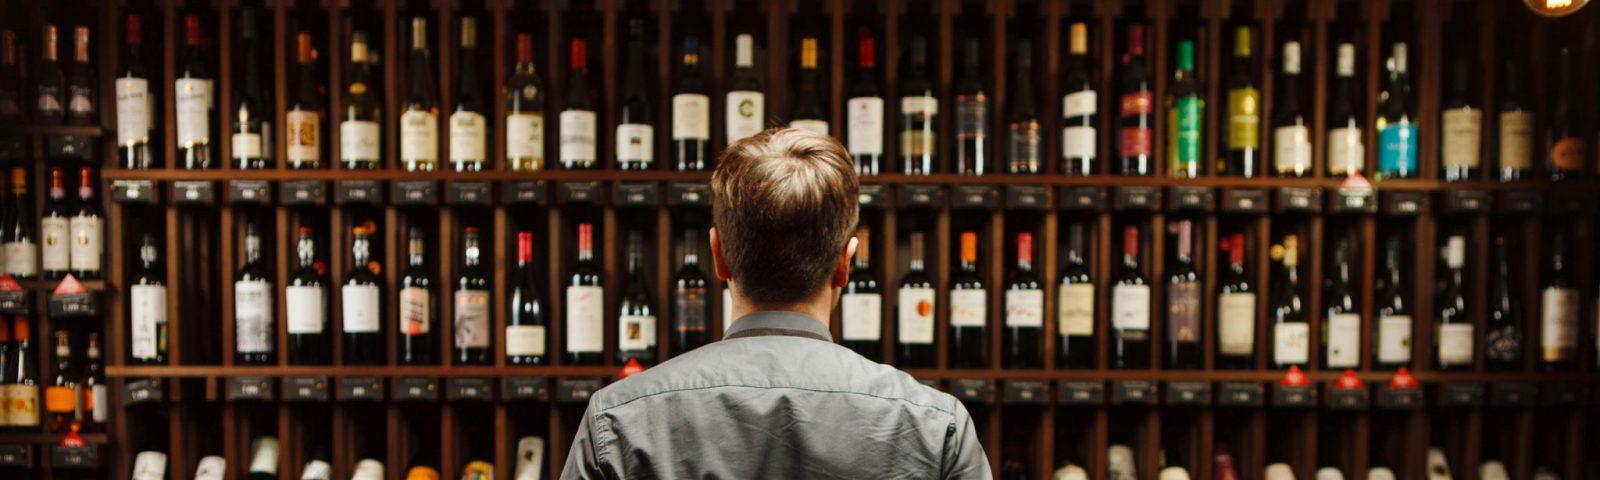 Premier Cru Fine Wine Shop